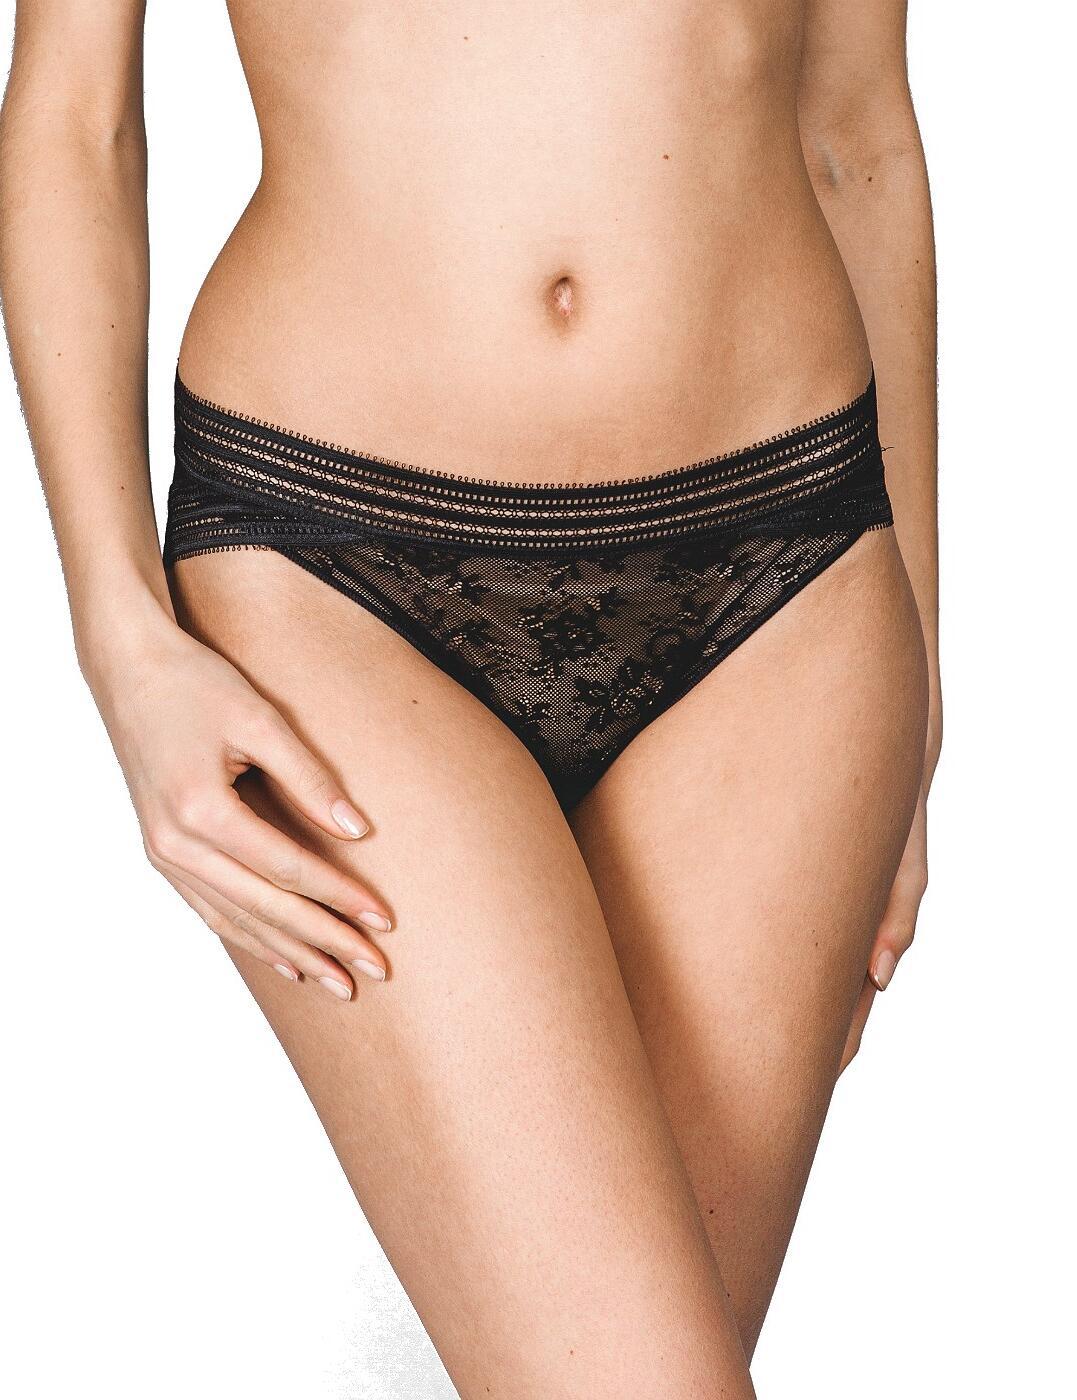 16463 Maison Lejaby Miss Lejaby Bikini Style Brief - 16463 Noir